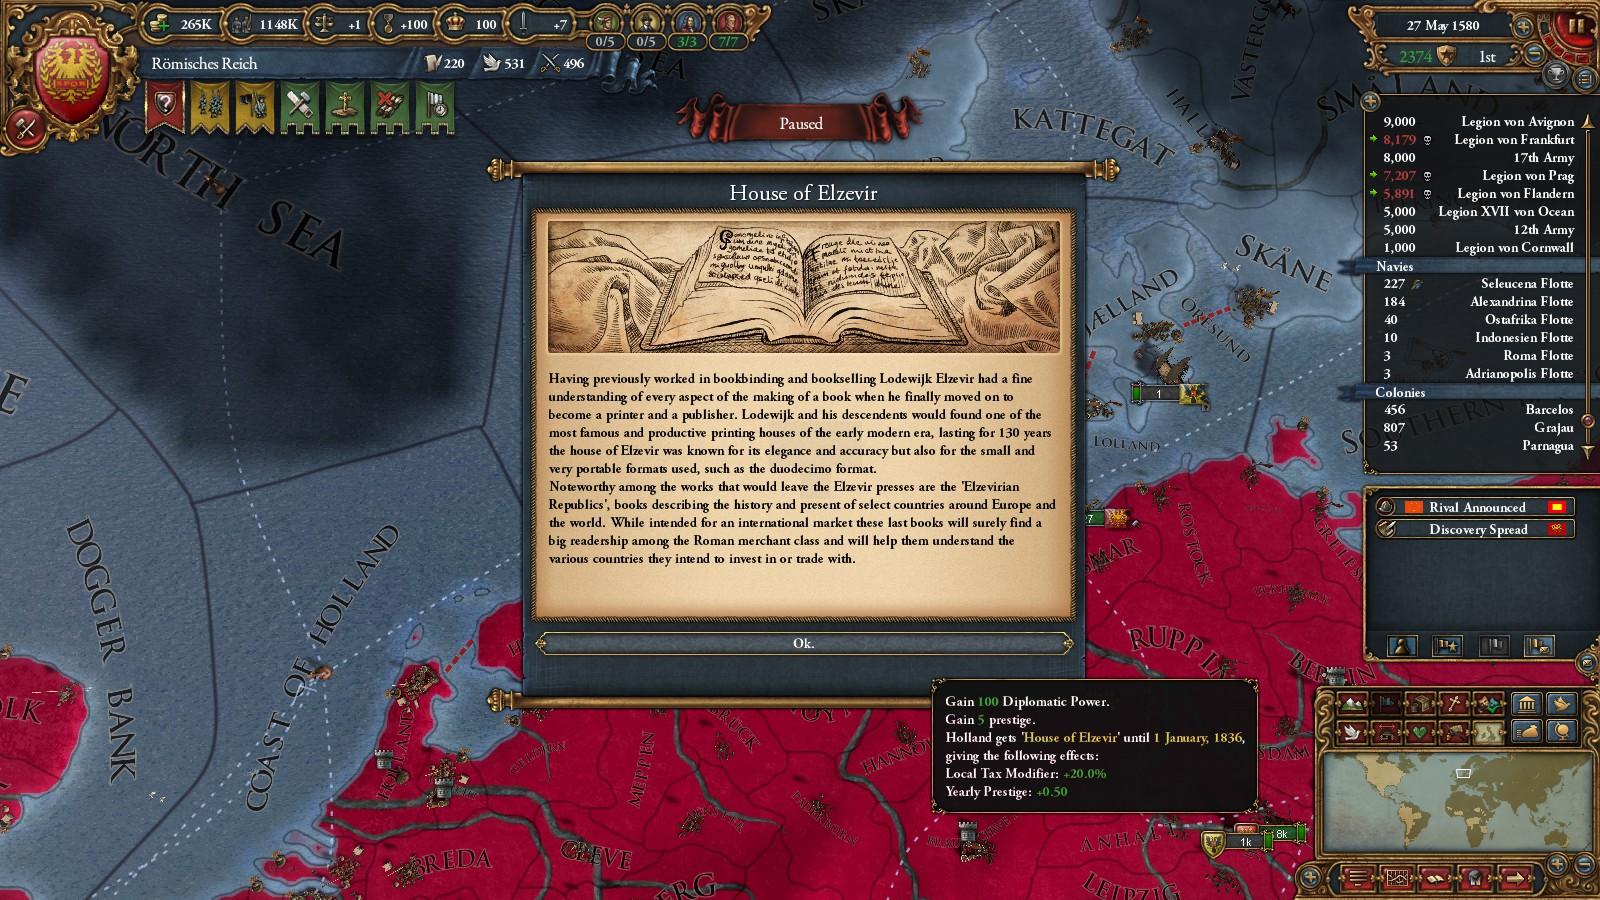 The Hohenzollern Empire 2: Über Alles - A Roman Reich Megacampaign